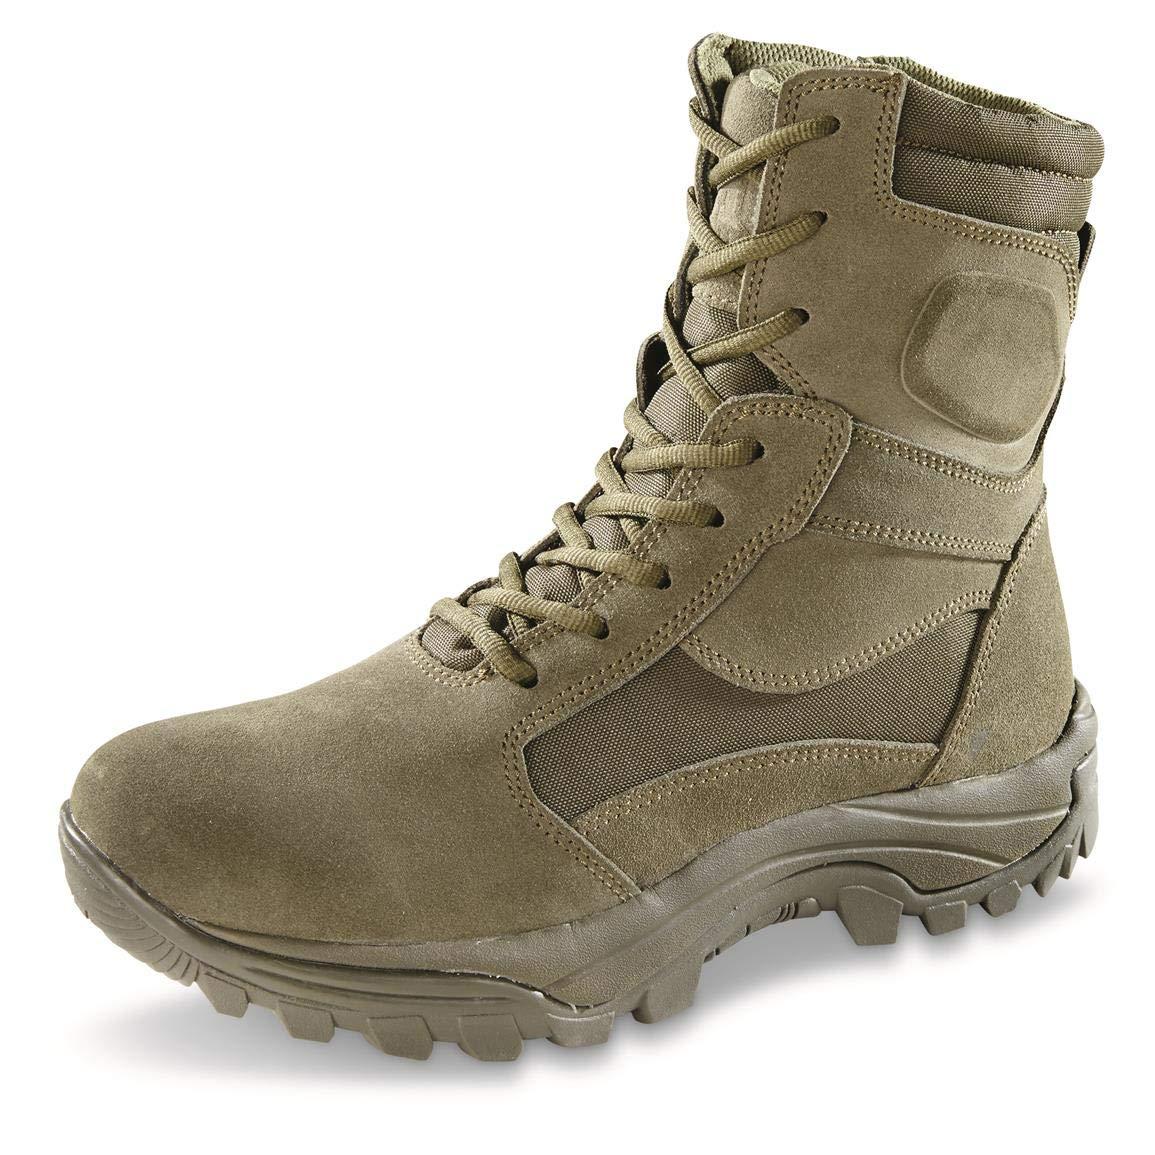 HQ ISSUE Men's Talos Waterproof 8'' Side-Zip Tactical Boots, Sage, 13D (Medium)